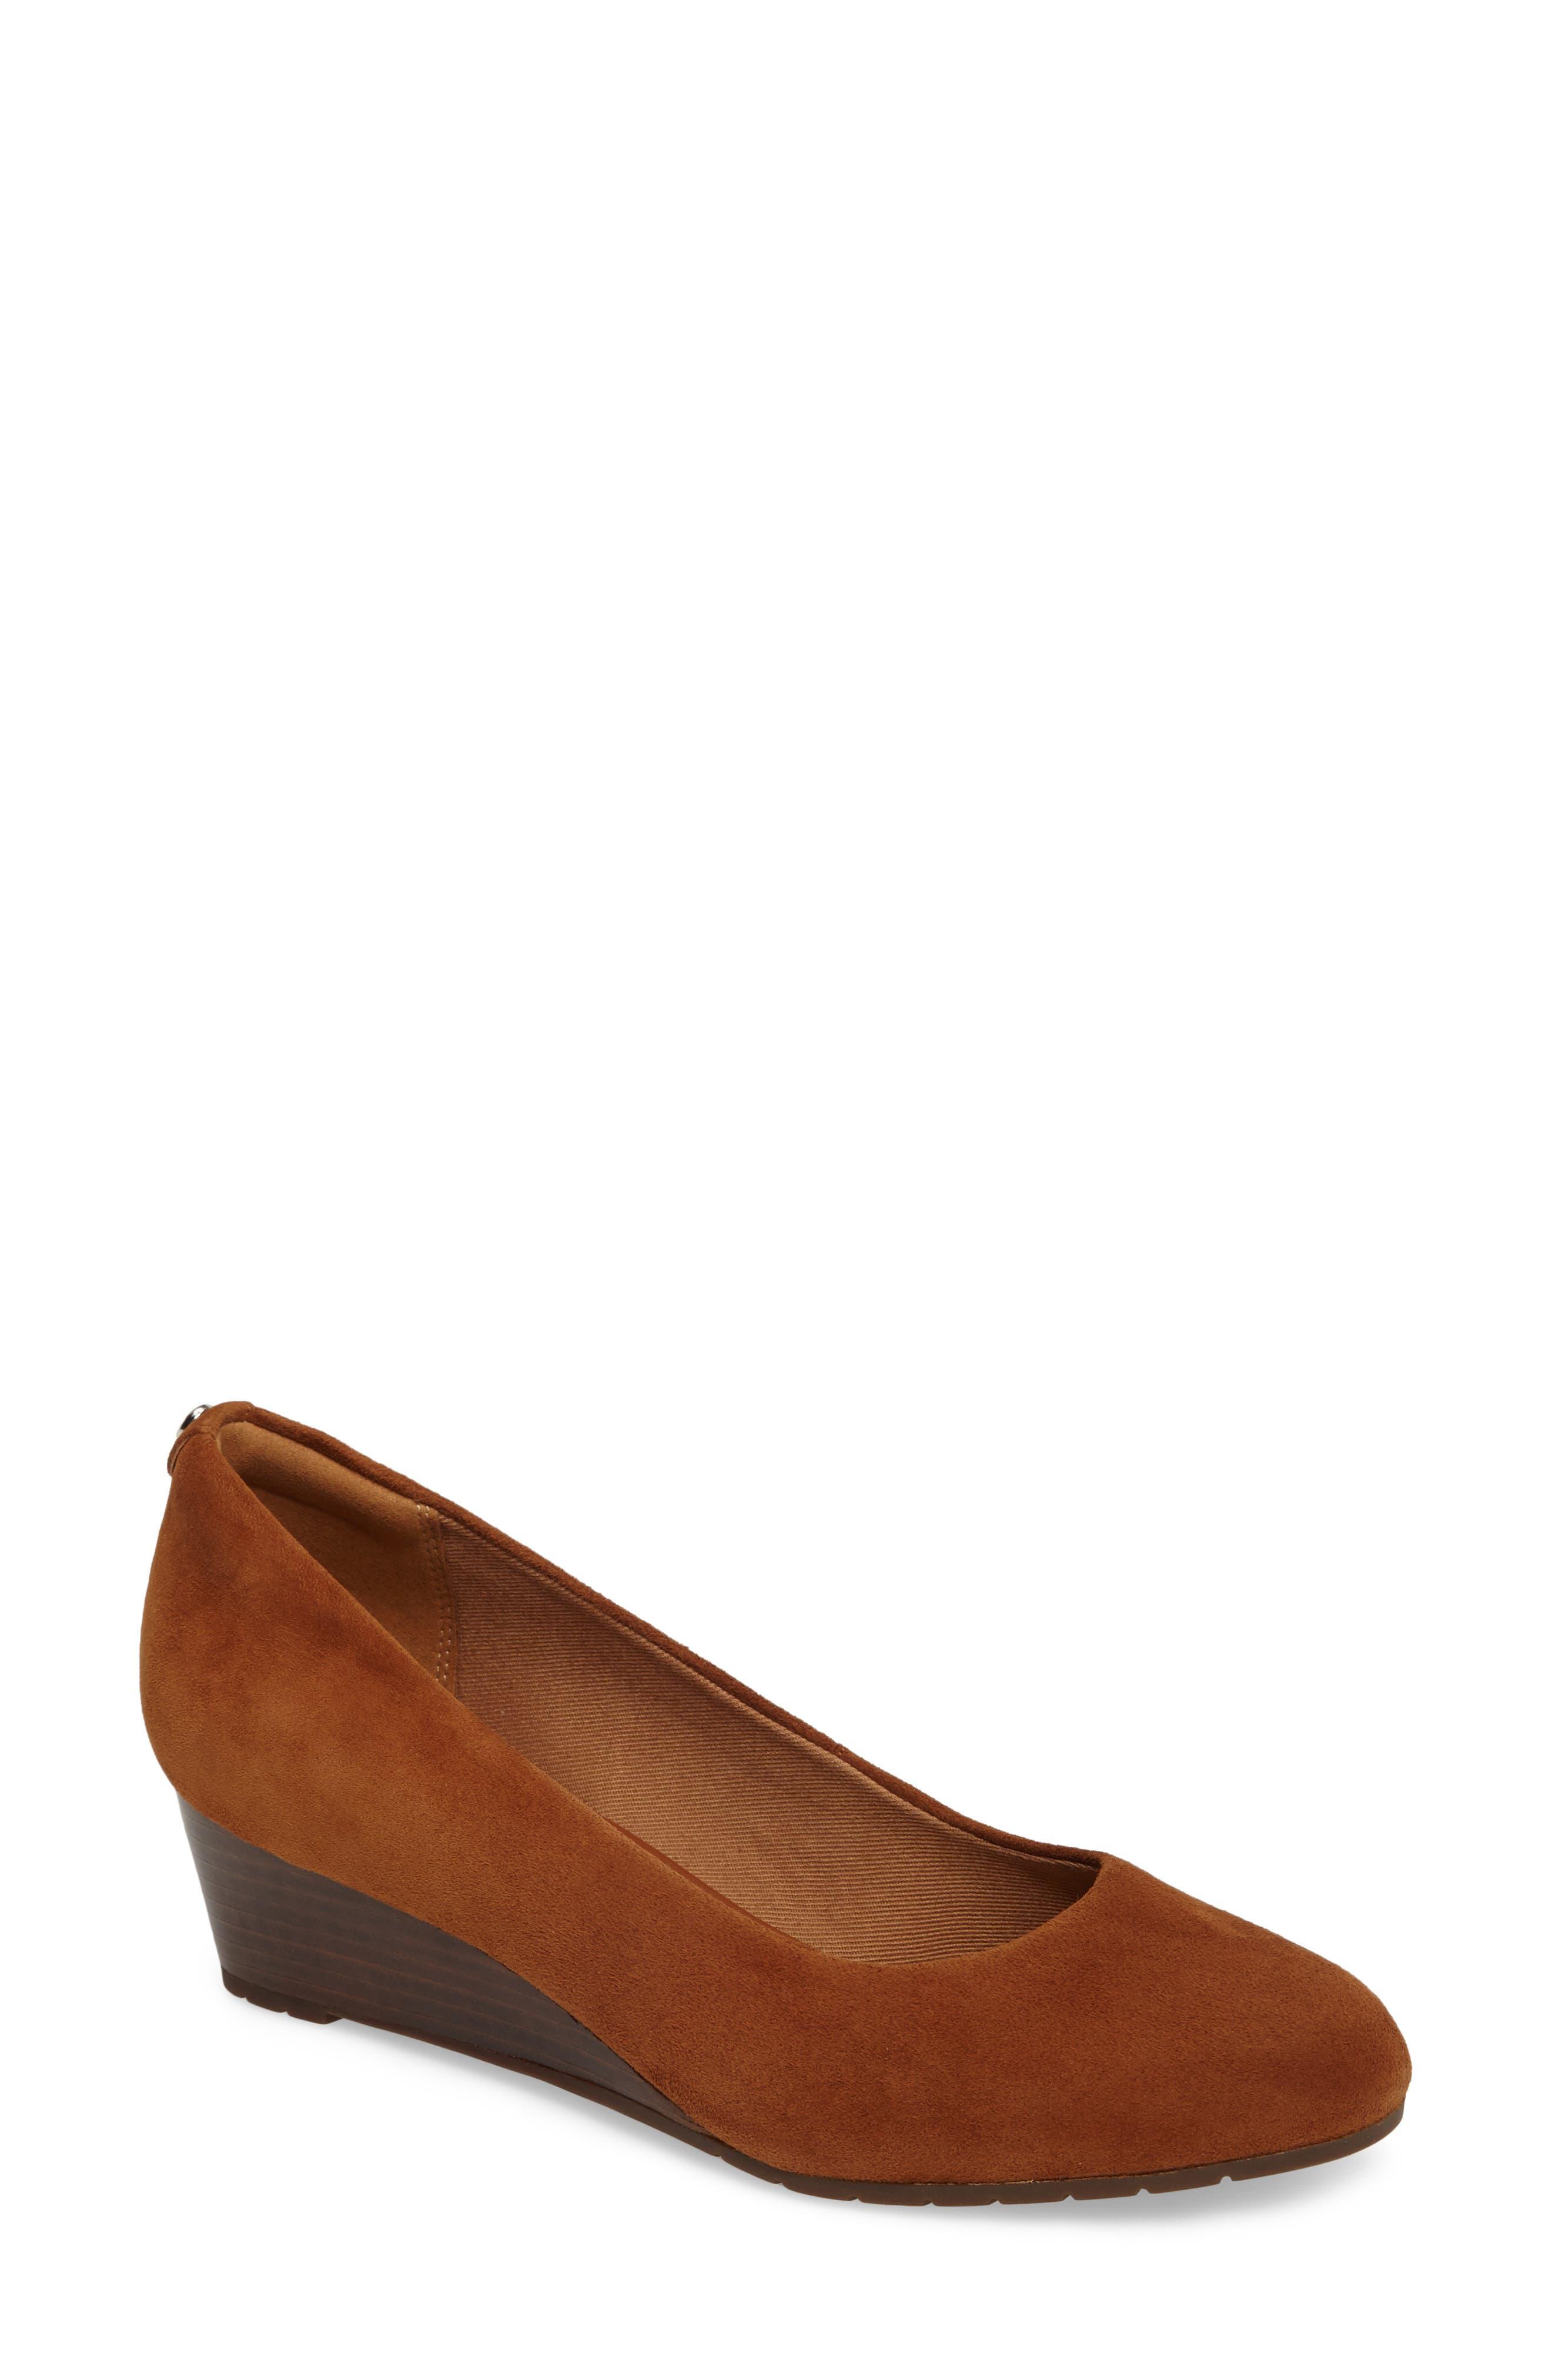 Clarks Women s Shoes